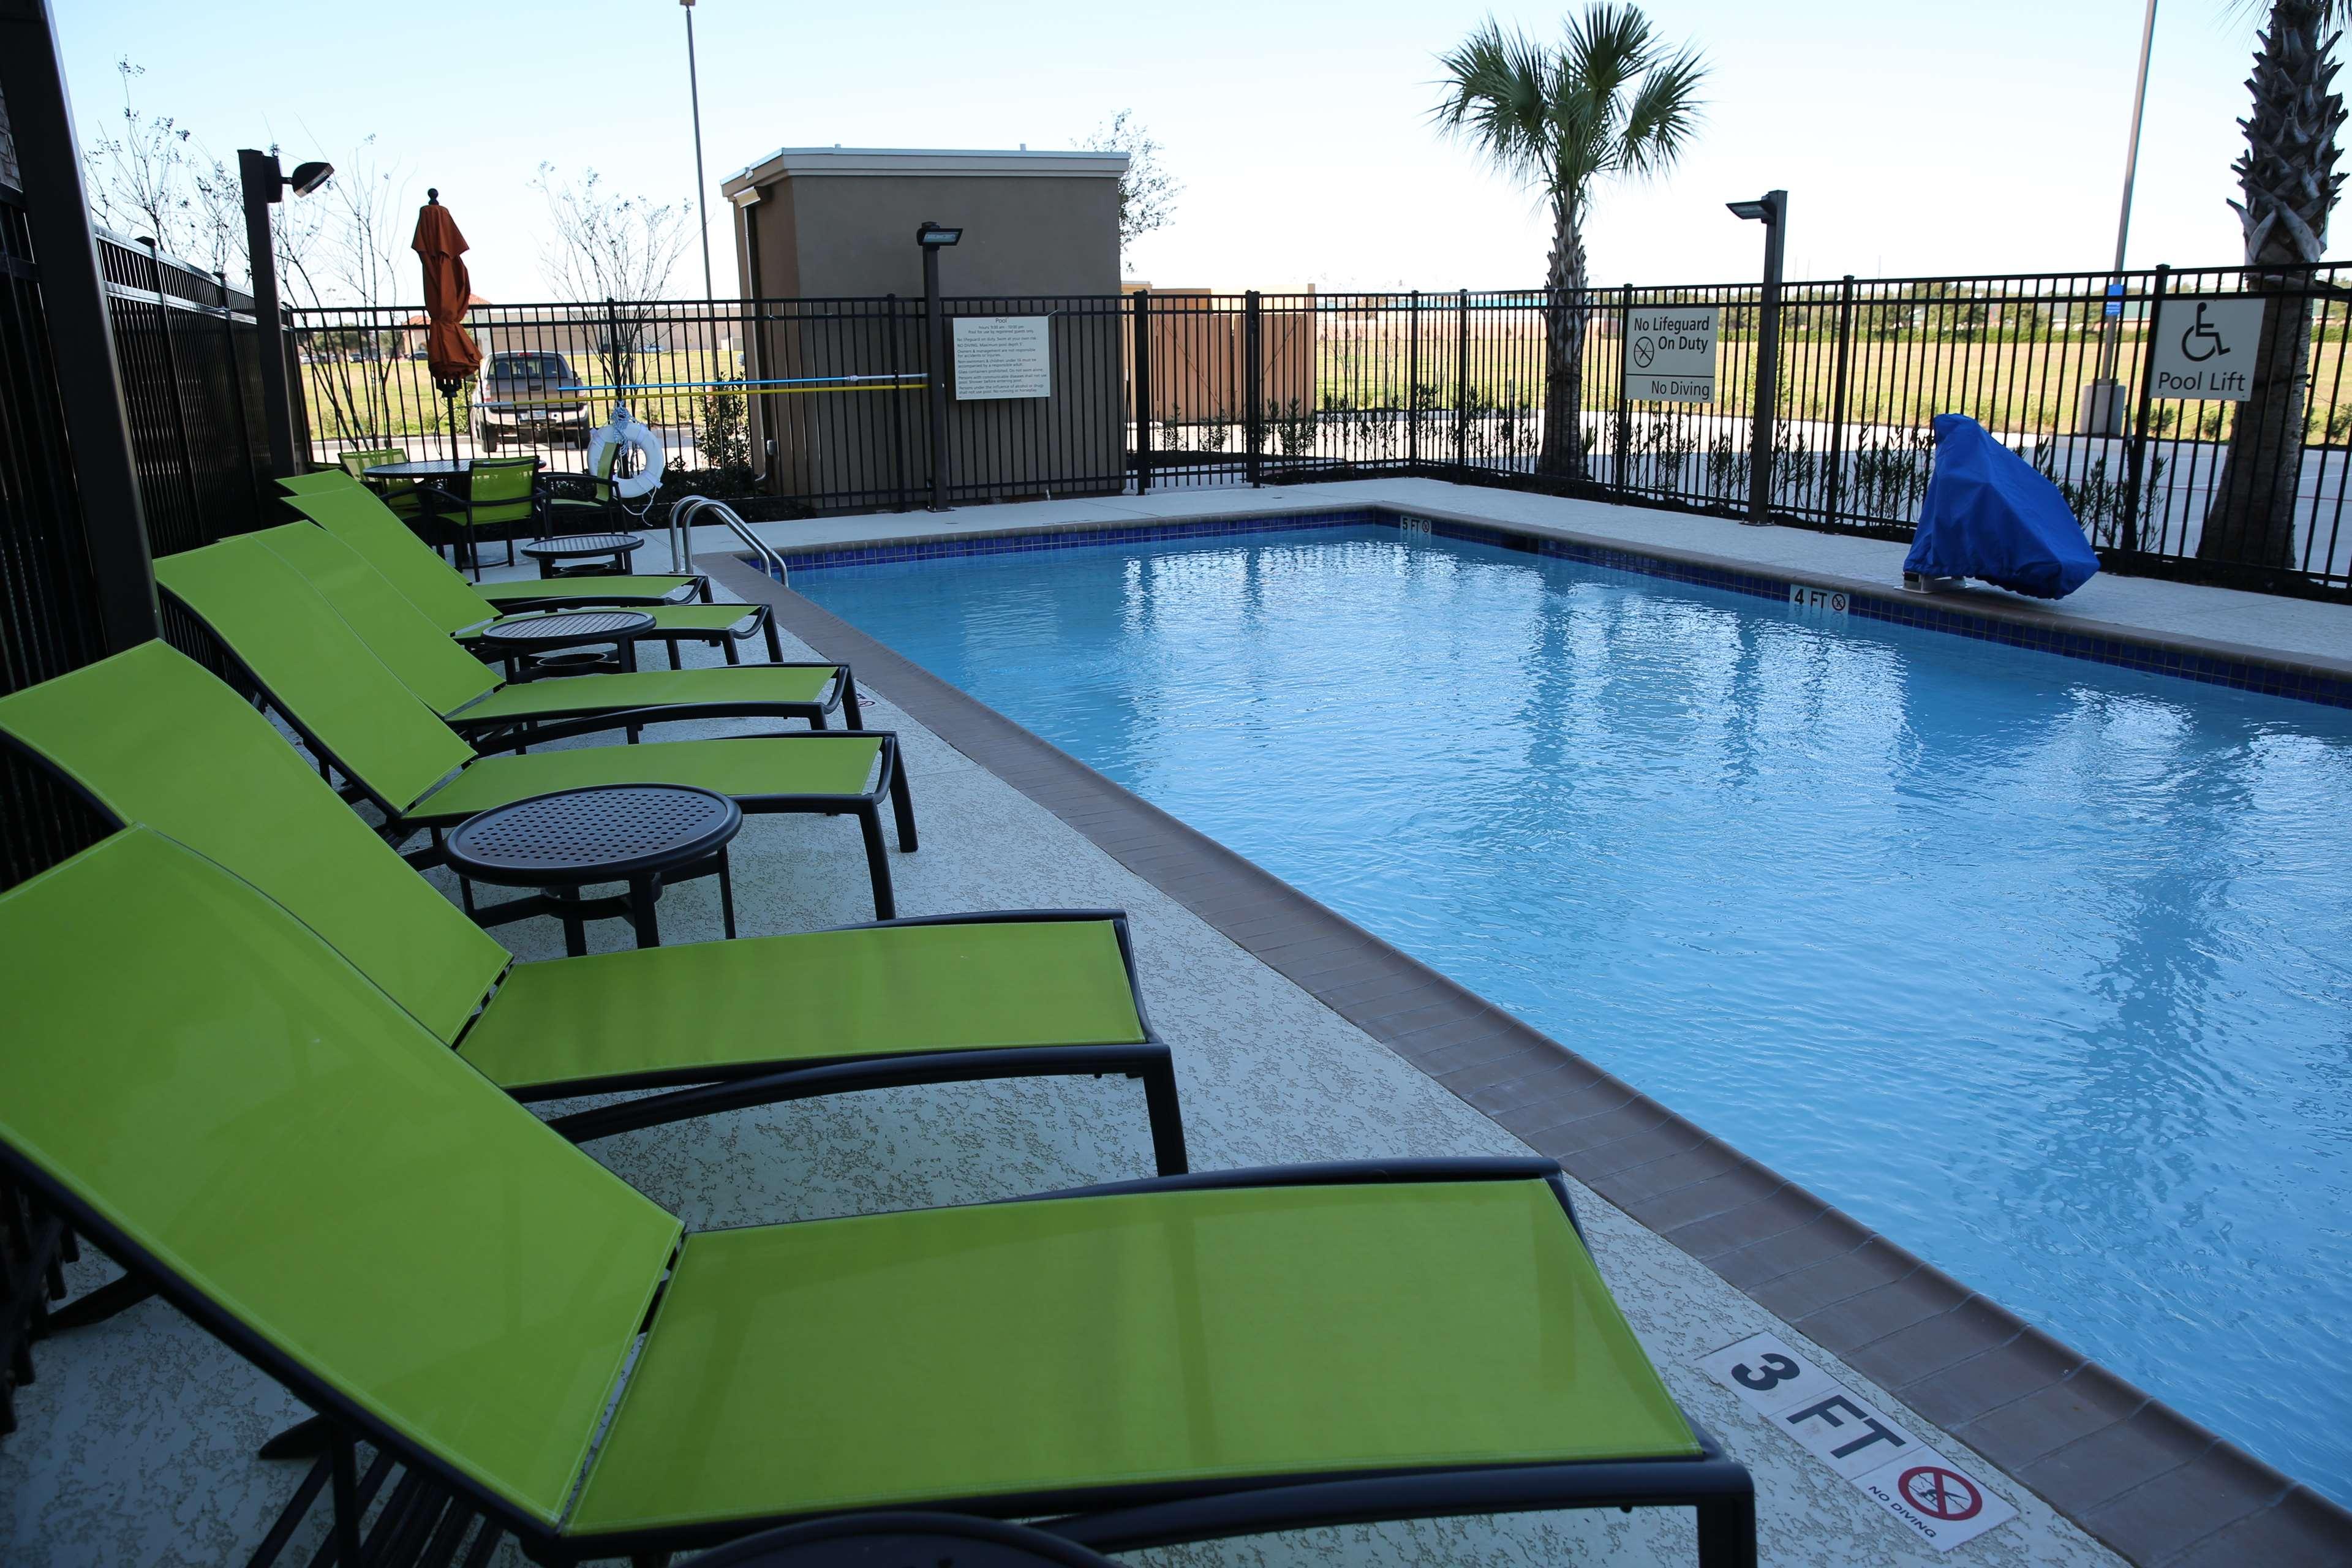 Hampton Inn & Suites Missouri City, TX image 14